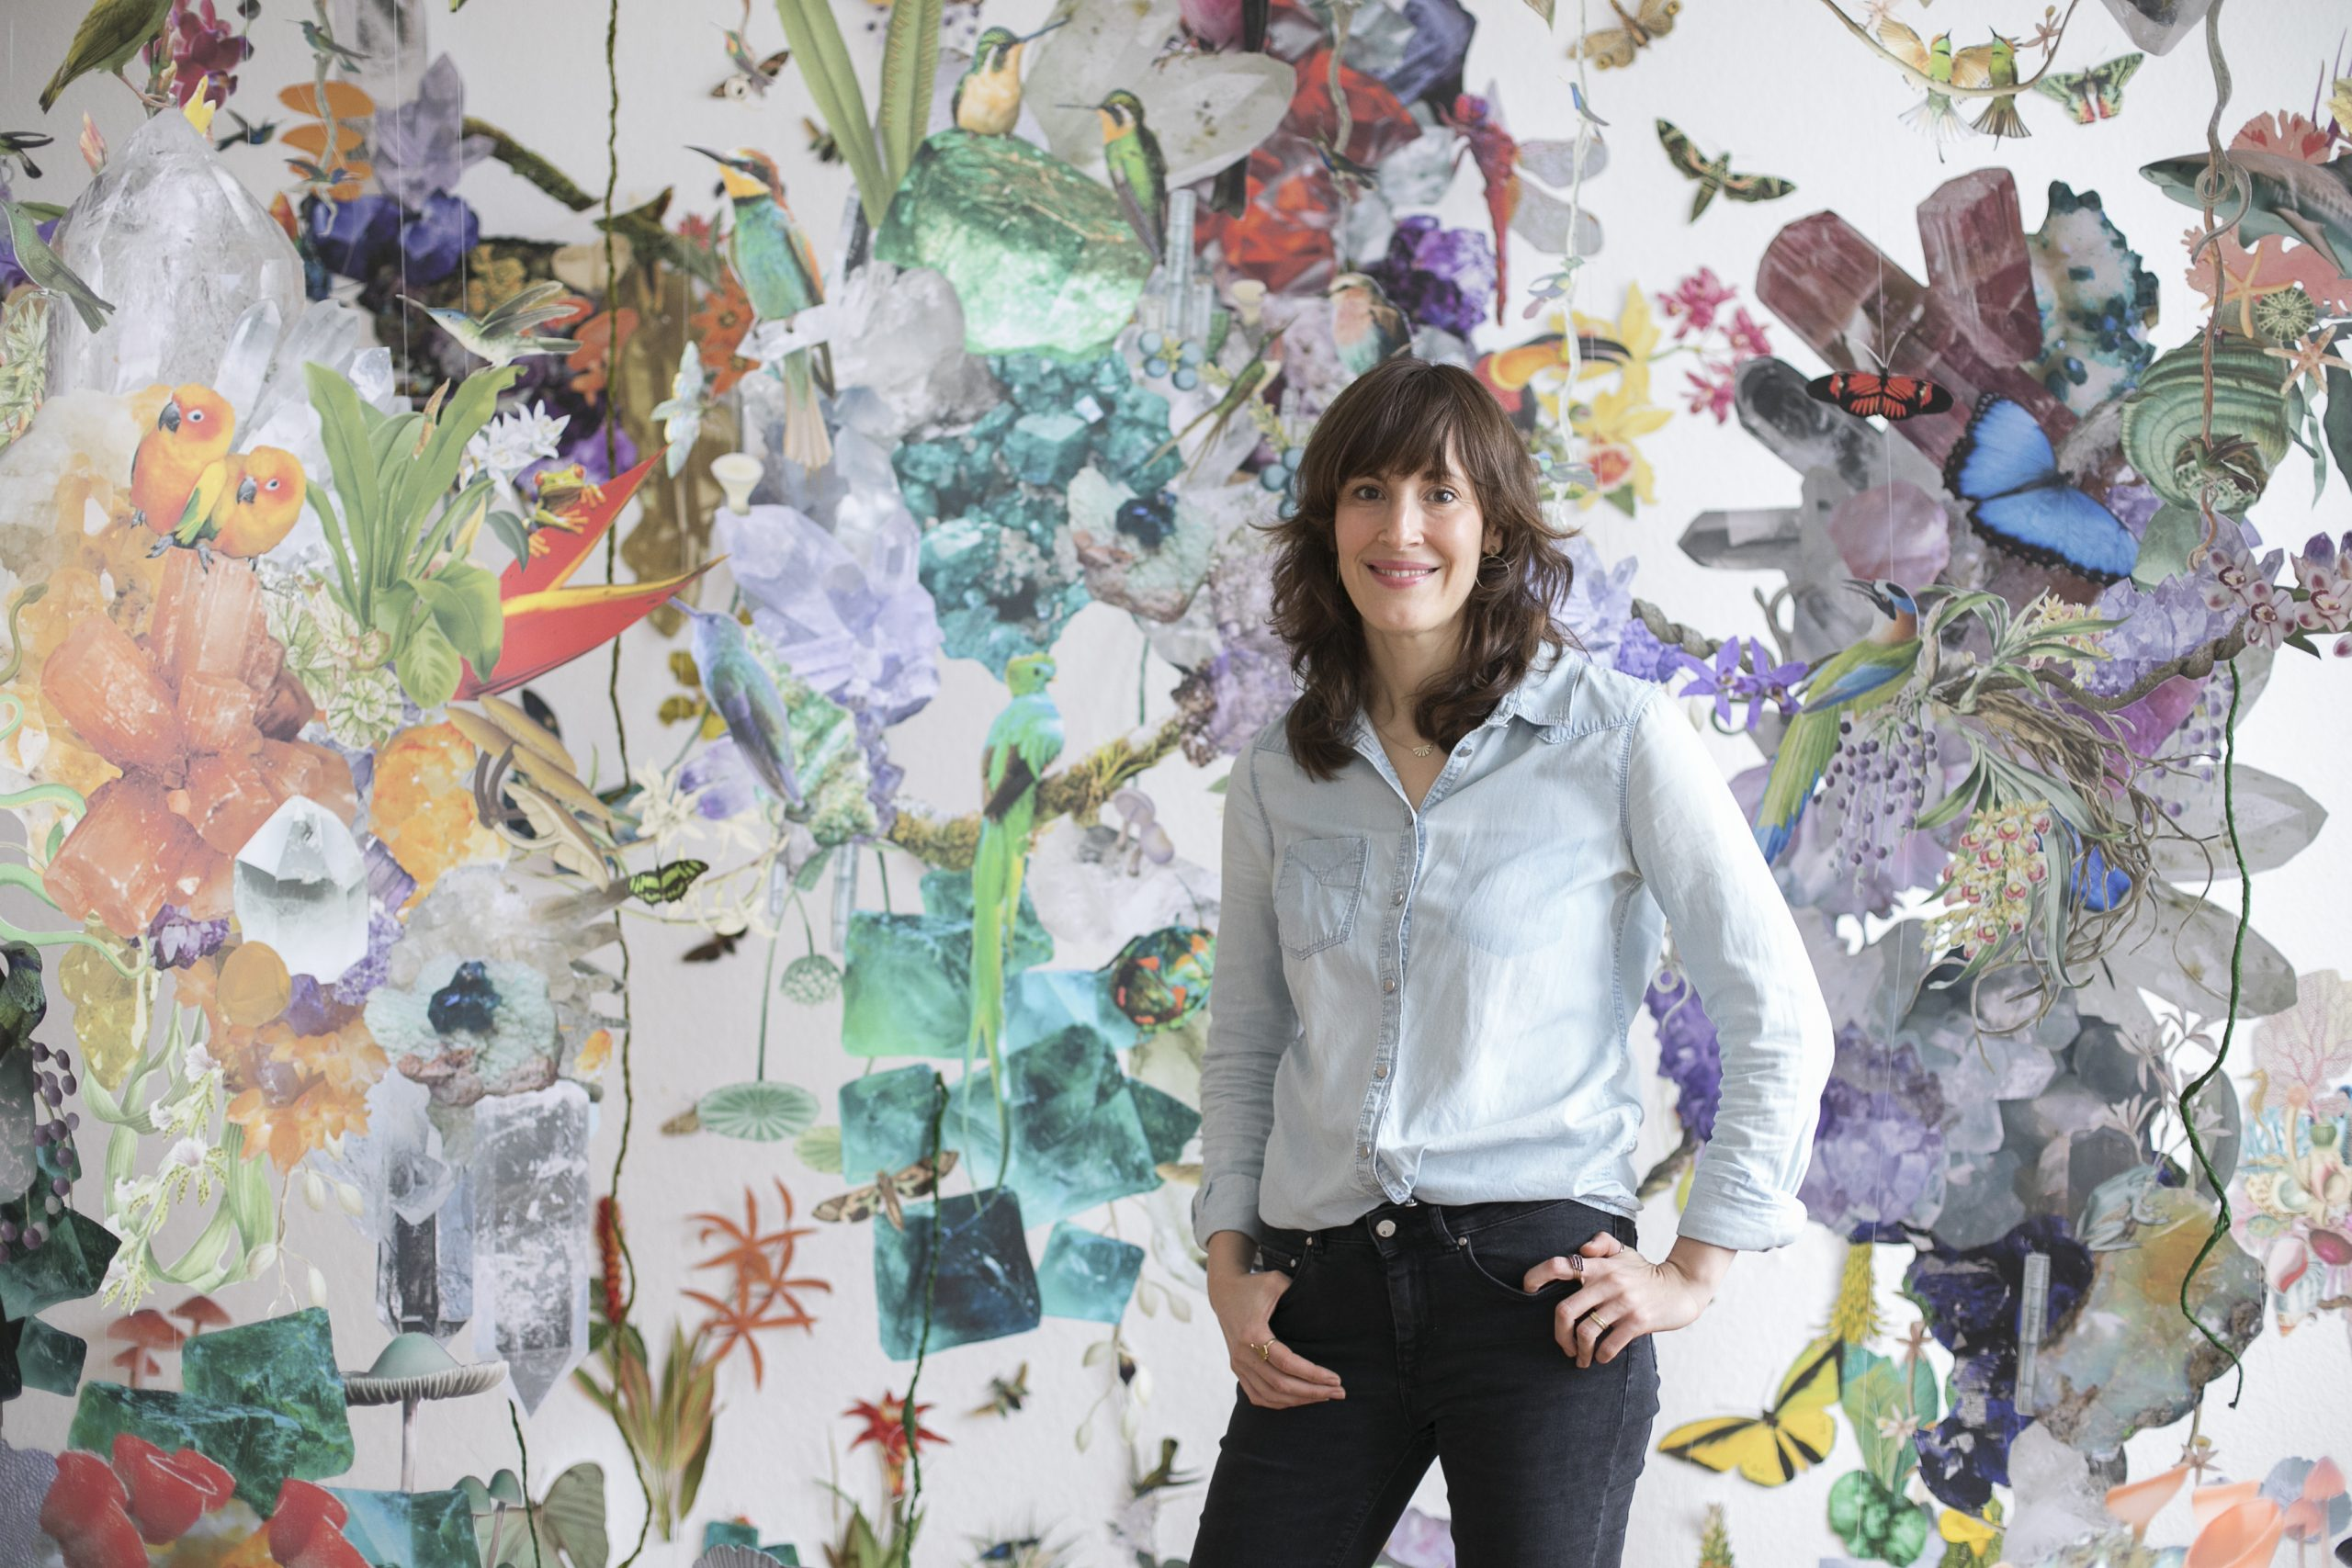 collage installation art featuring various biodiversity figures